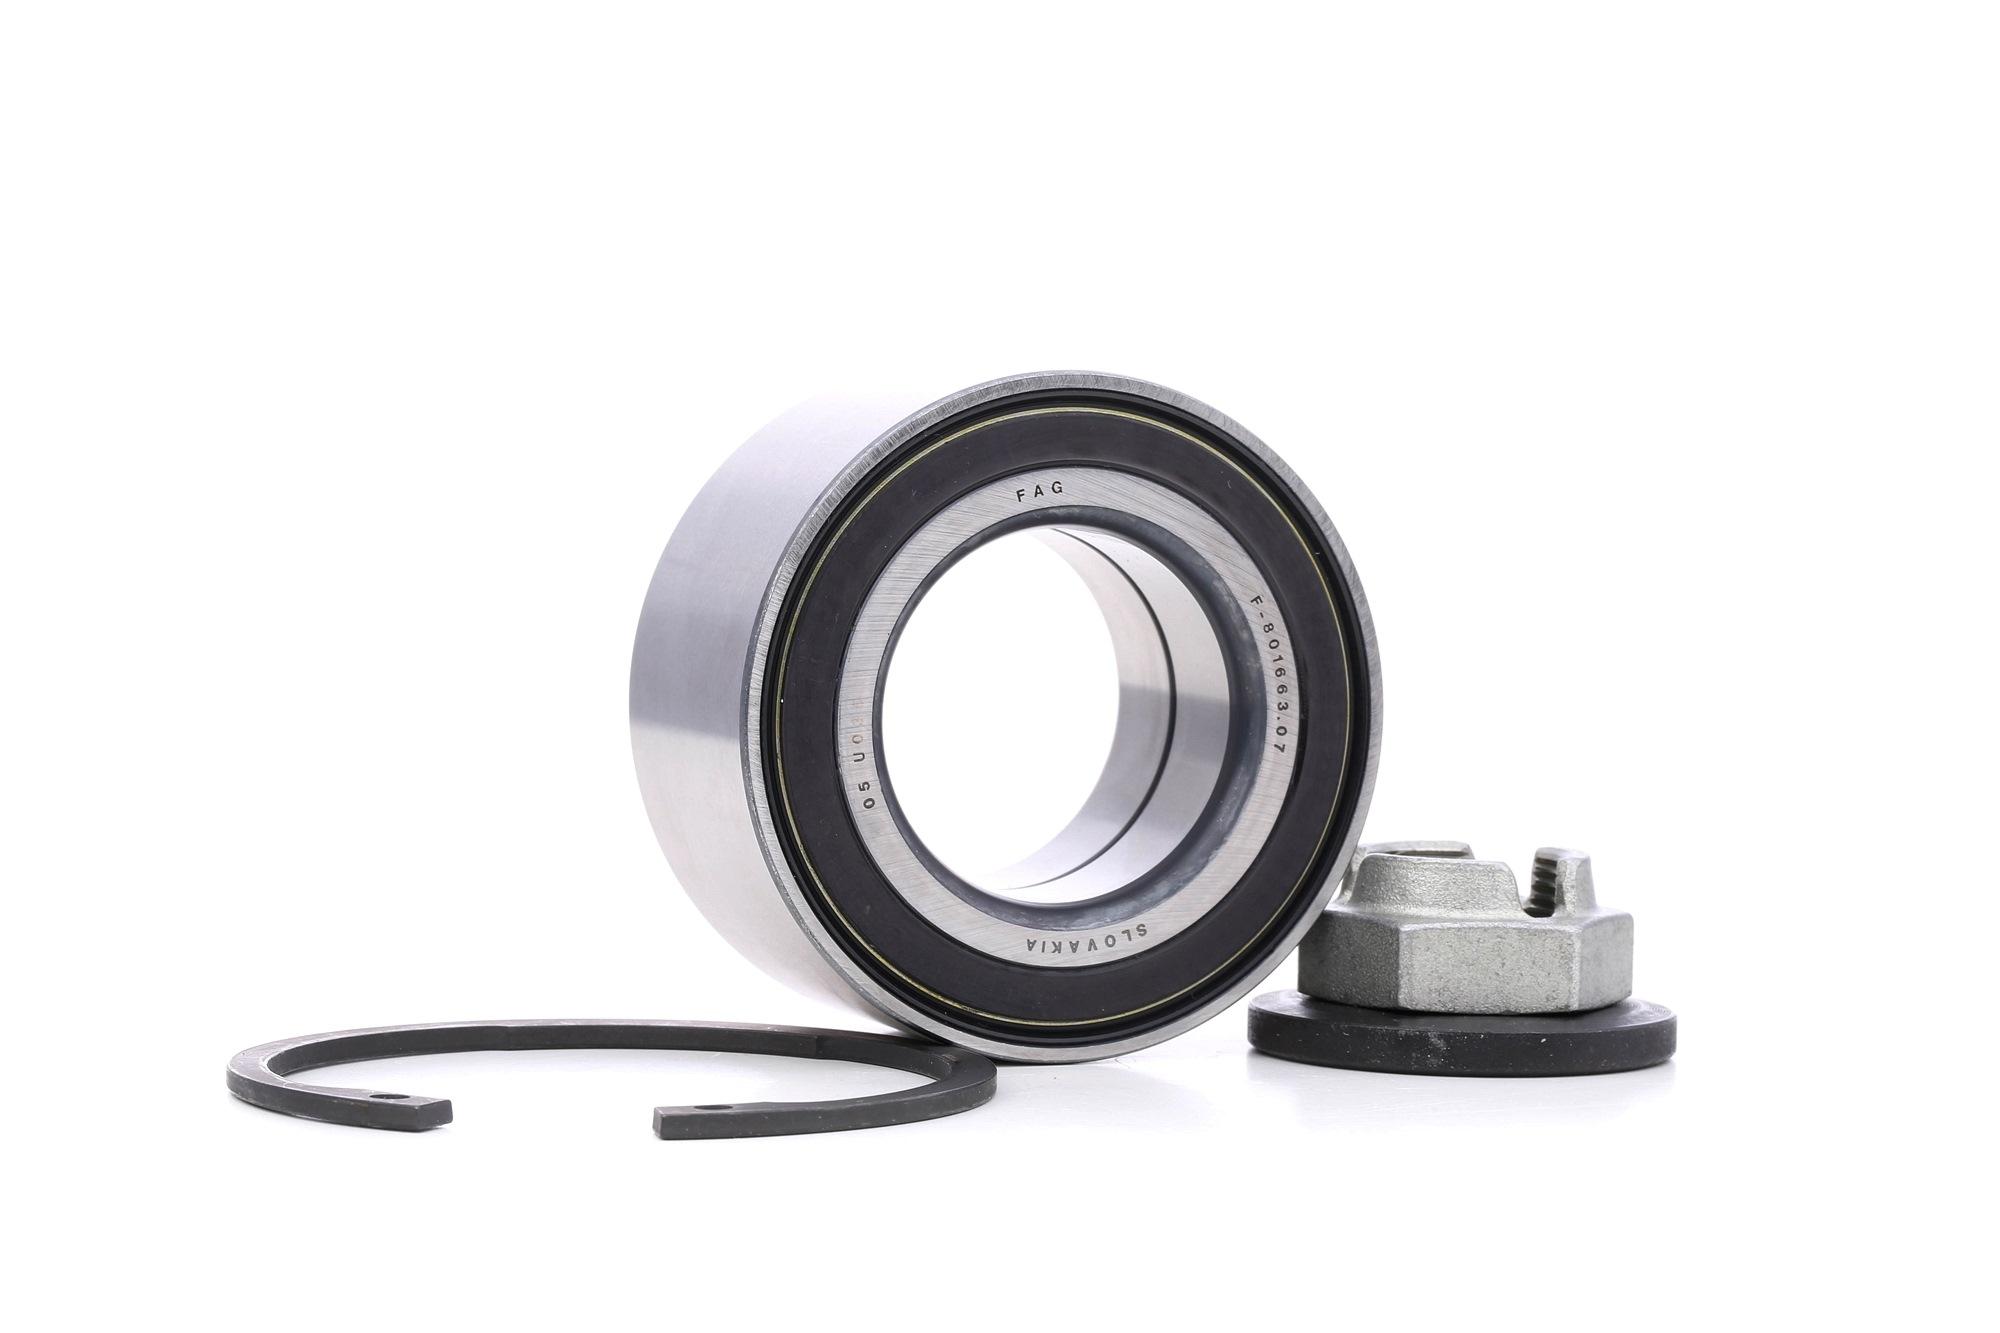 Wheel Bearing FAG 713 6781 00 rating